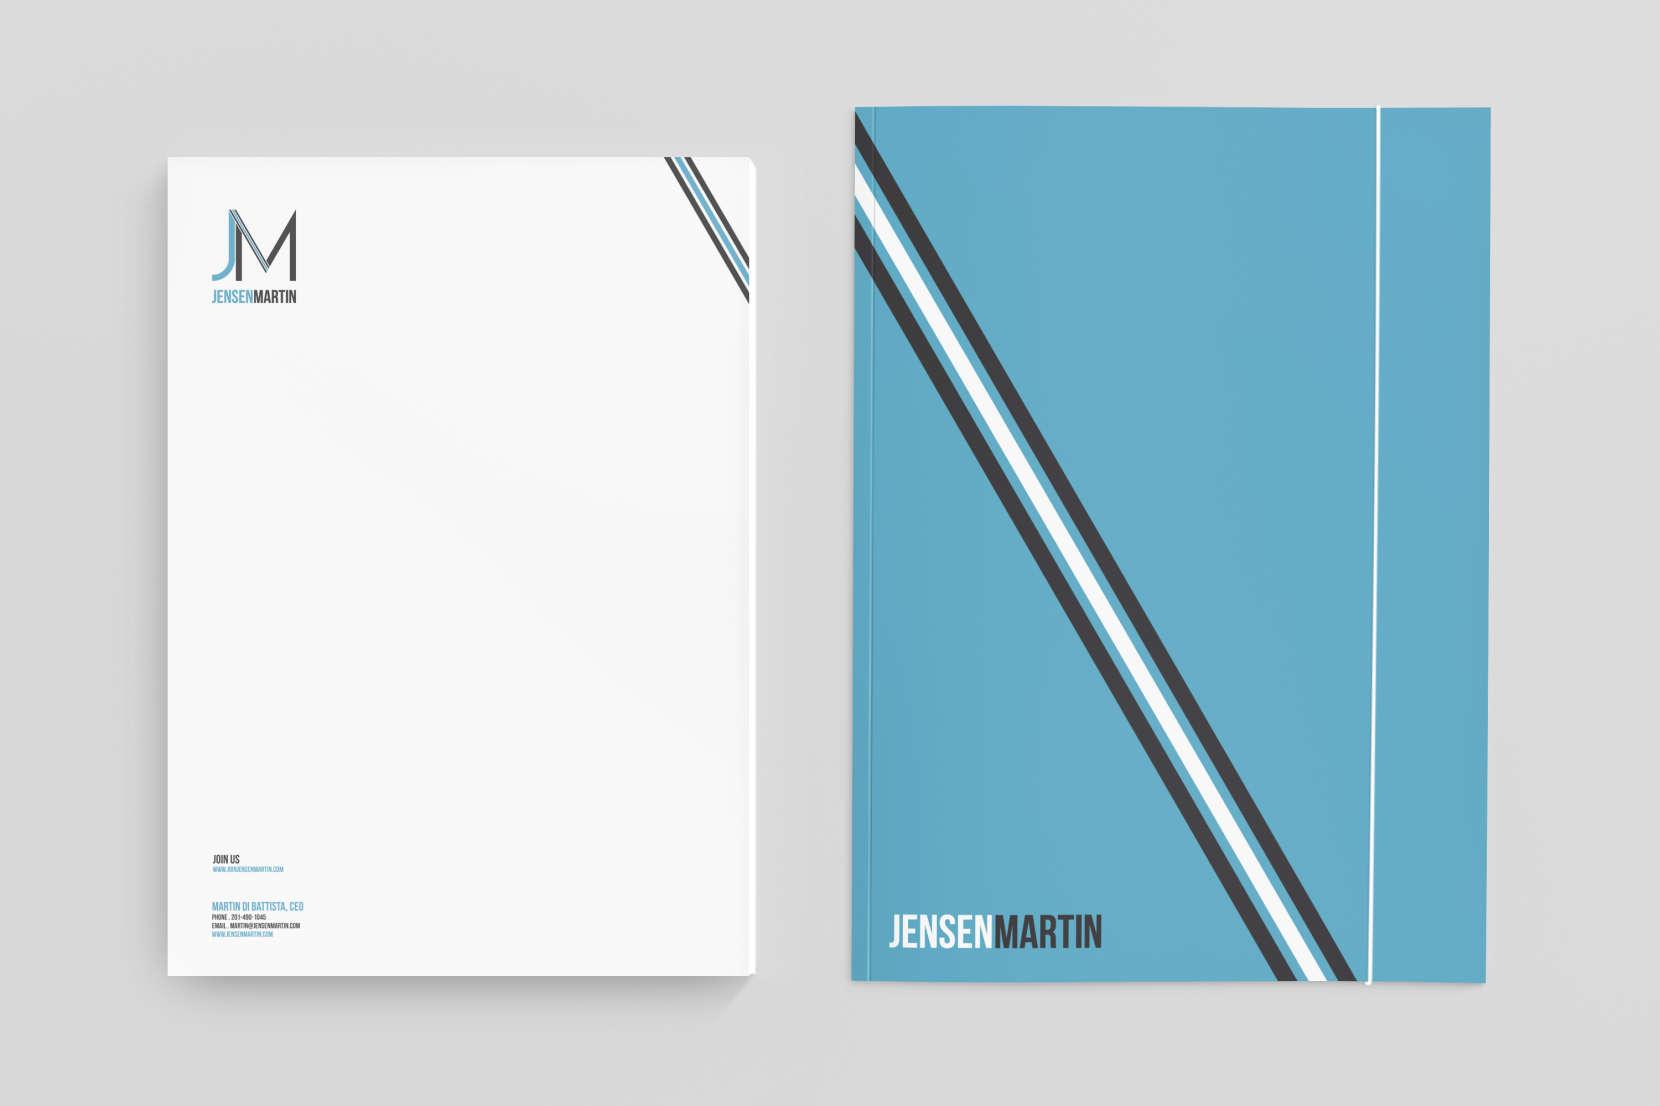 8_10-Branding-Identitny-Mockup-2-jm-1660x1106.jpg